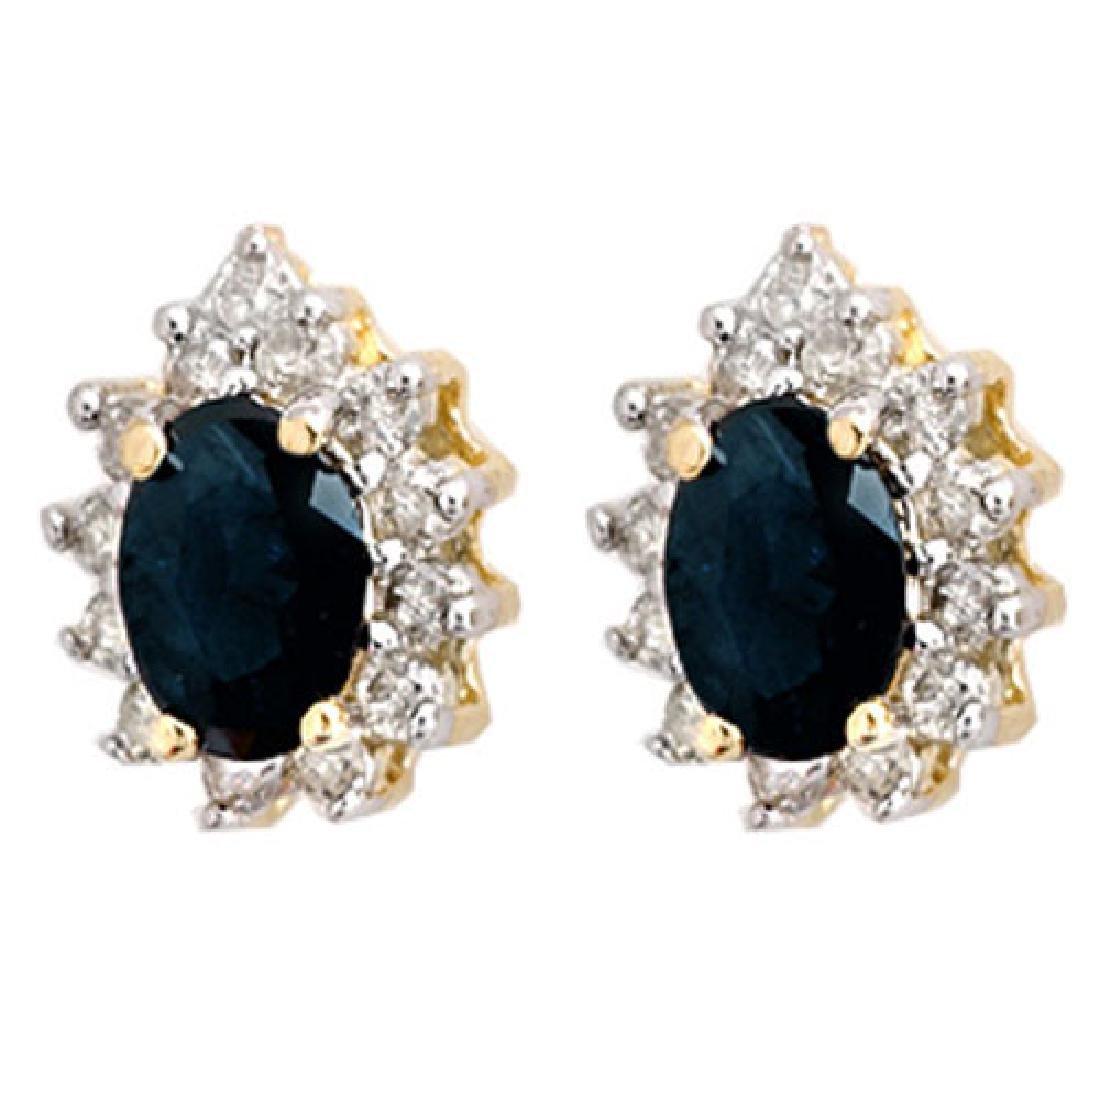 5.46 CTW Blue Sapphire & Diamond Earrings 14K Yellow